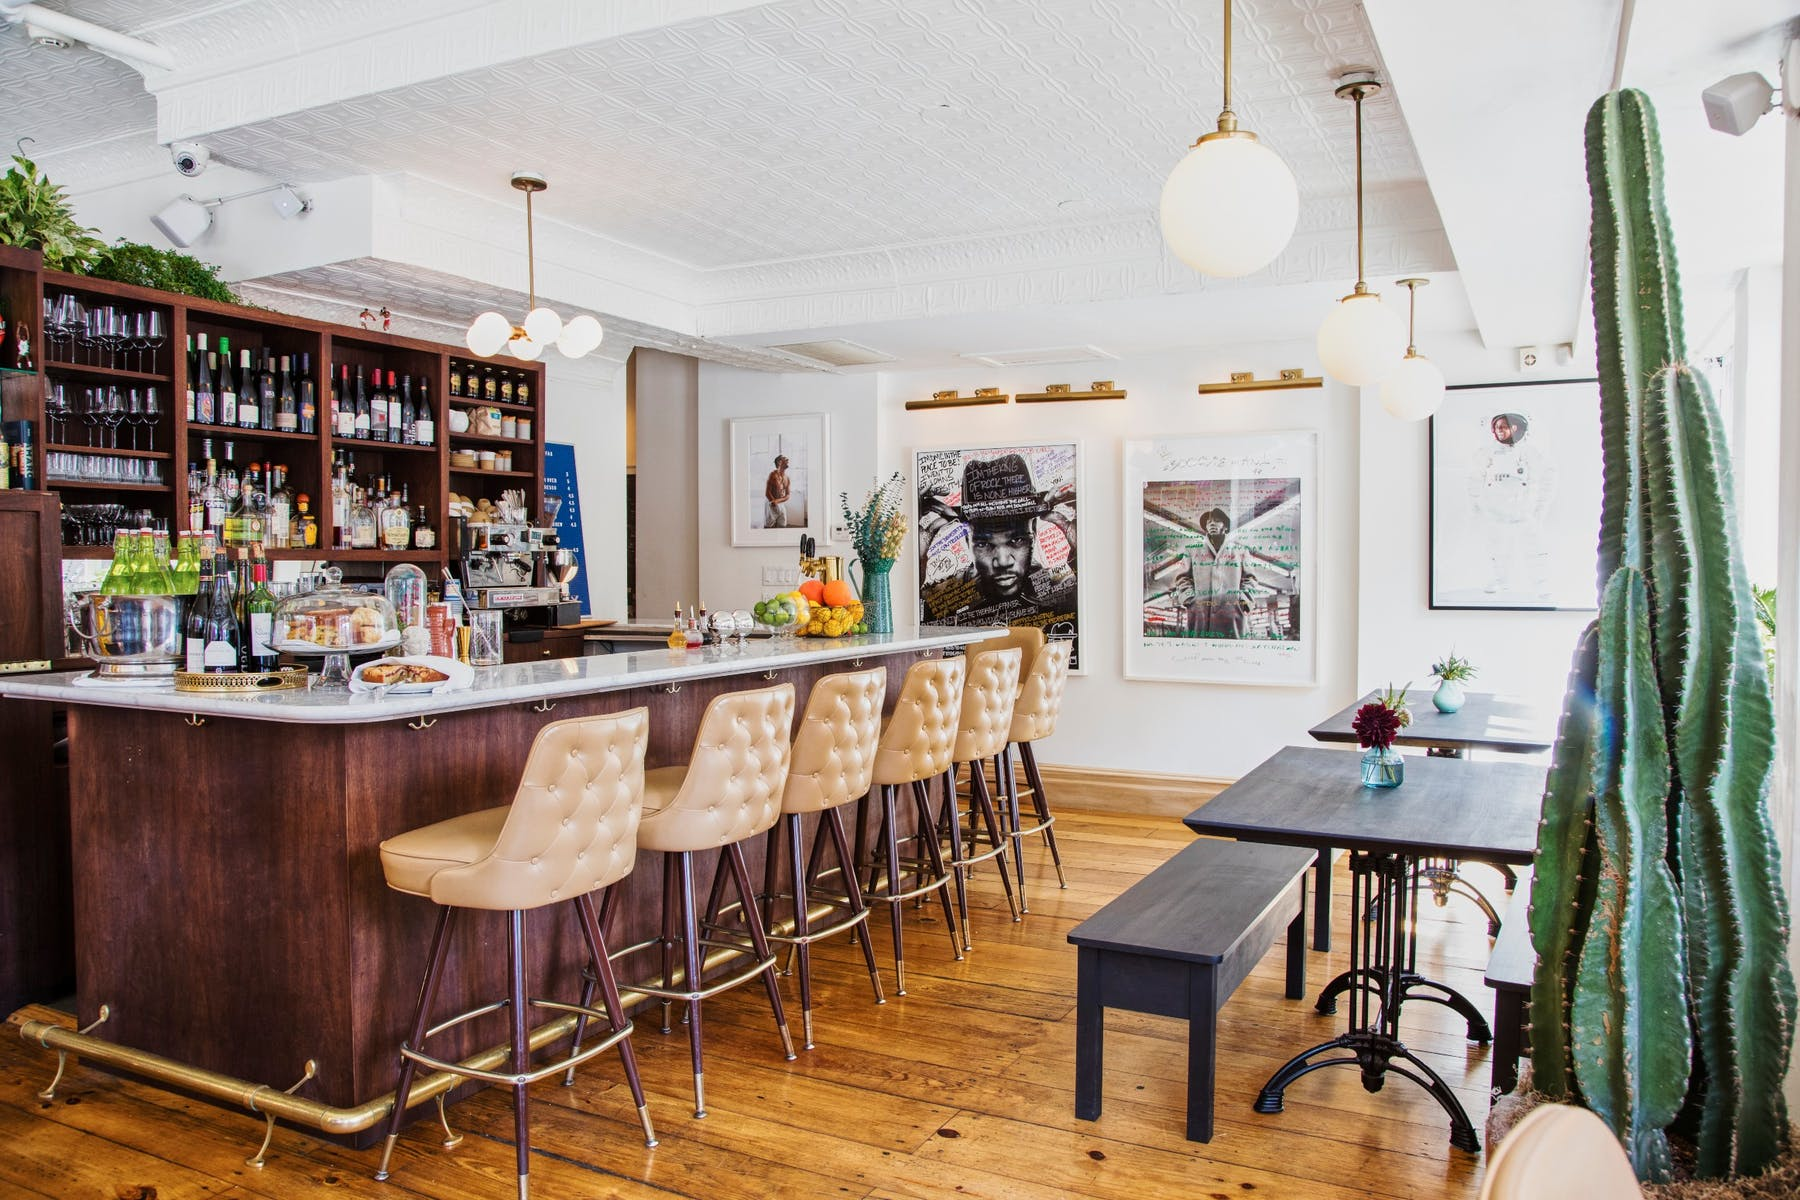 Fairfax bar and stools